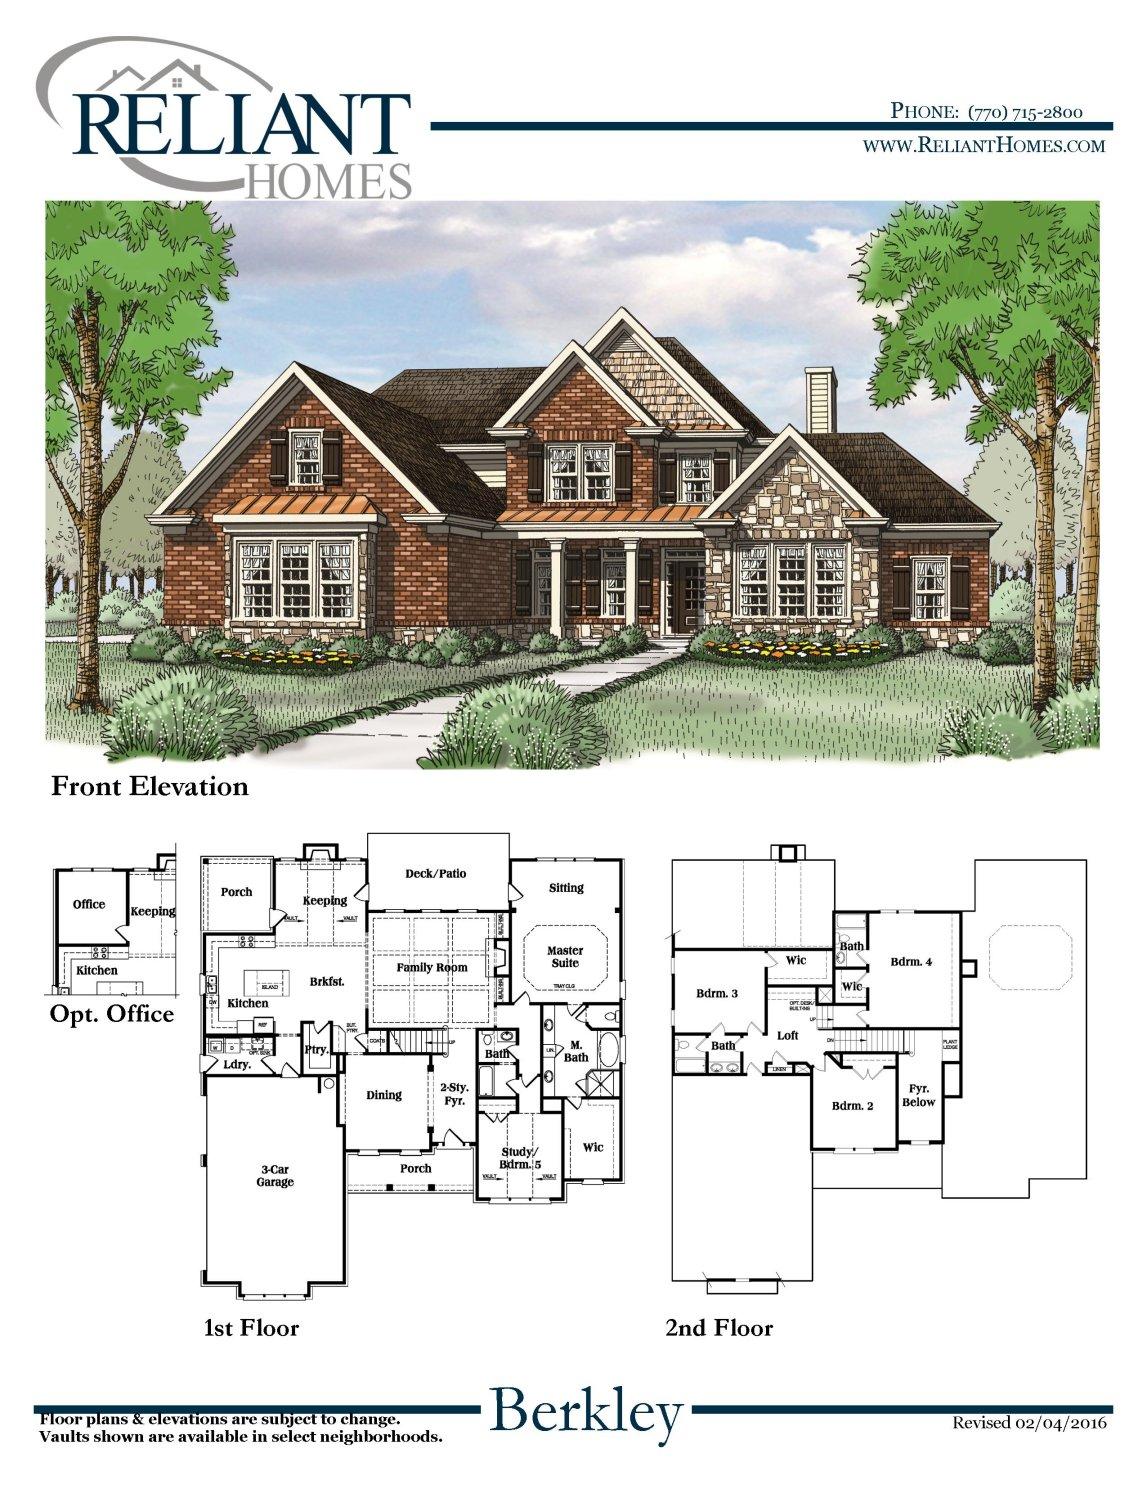 Berkley b se reliant homes new homes in atlanta for Reliant homes floor plans